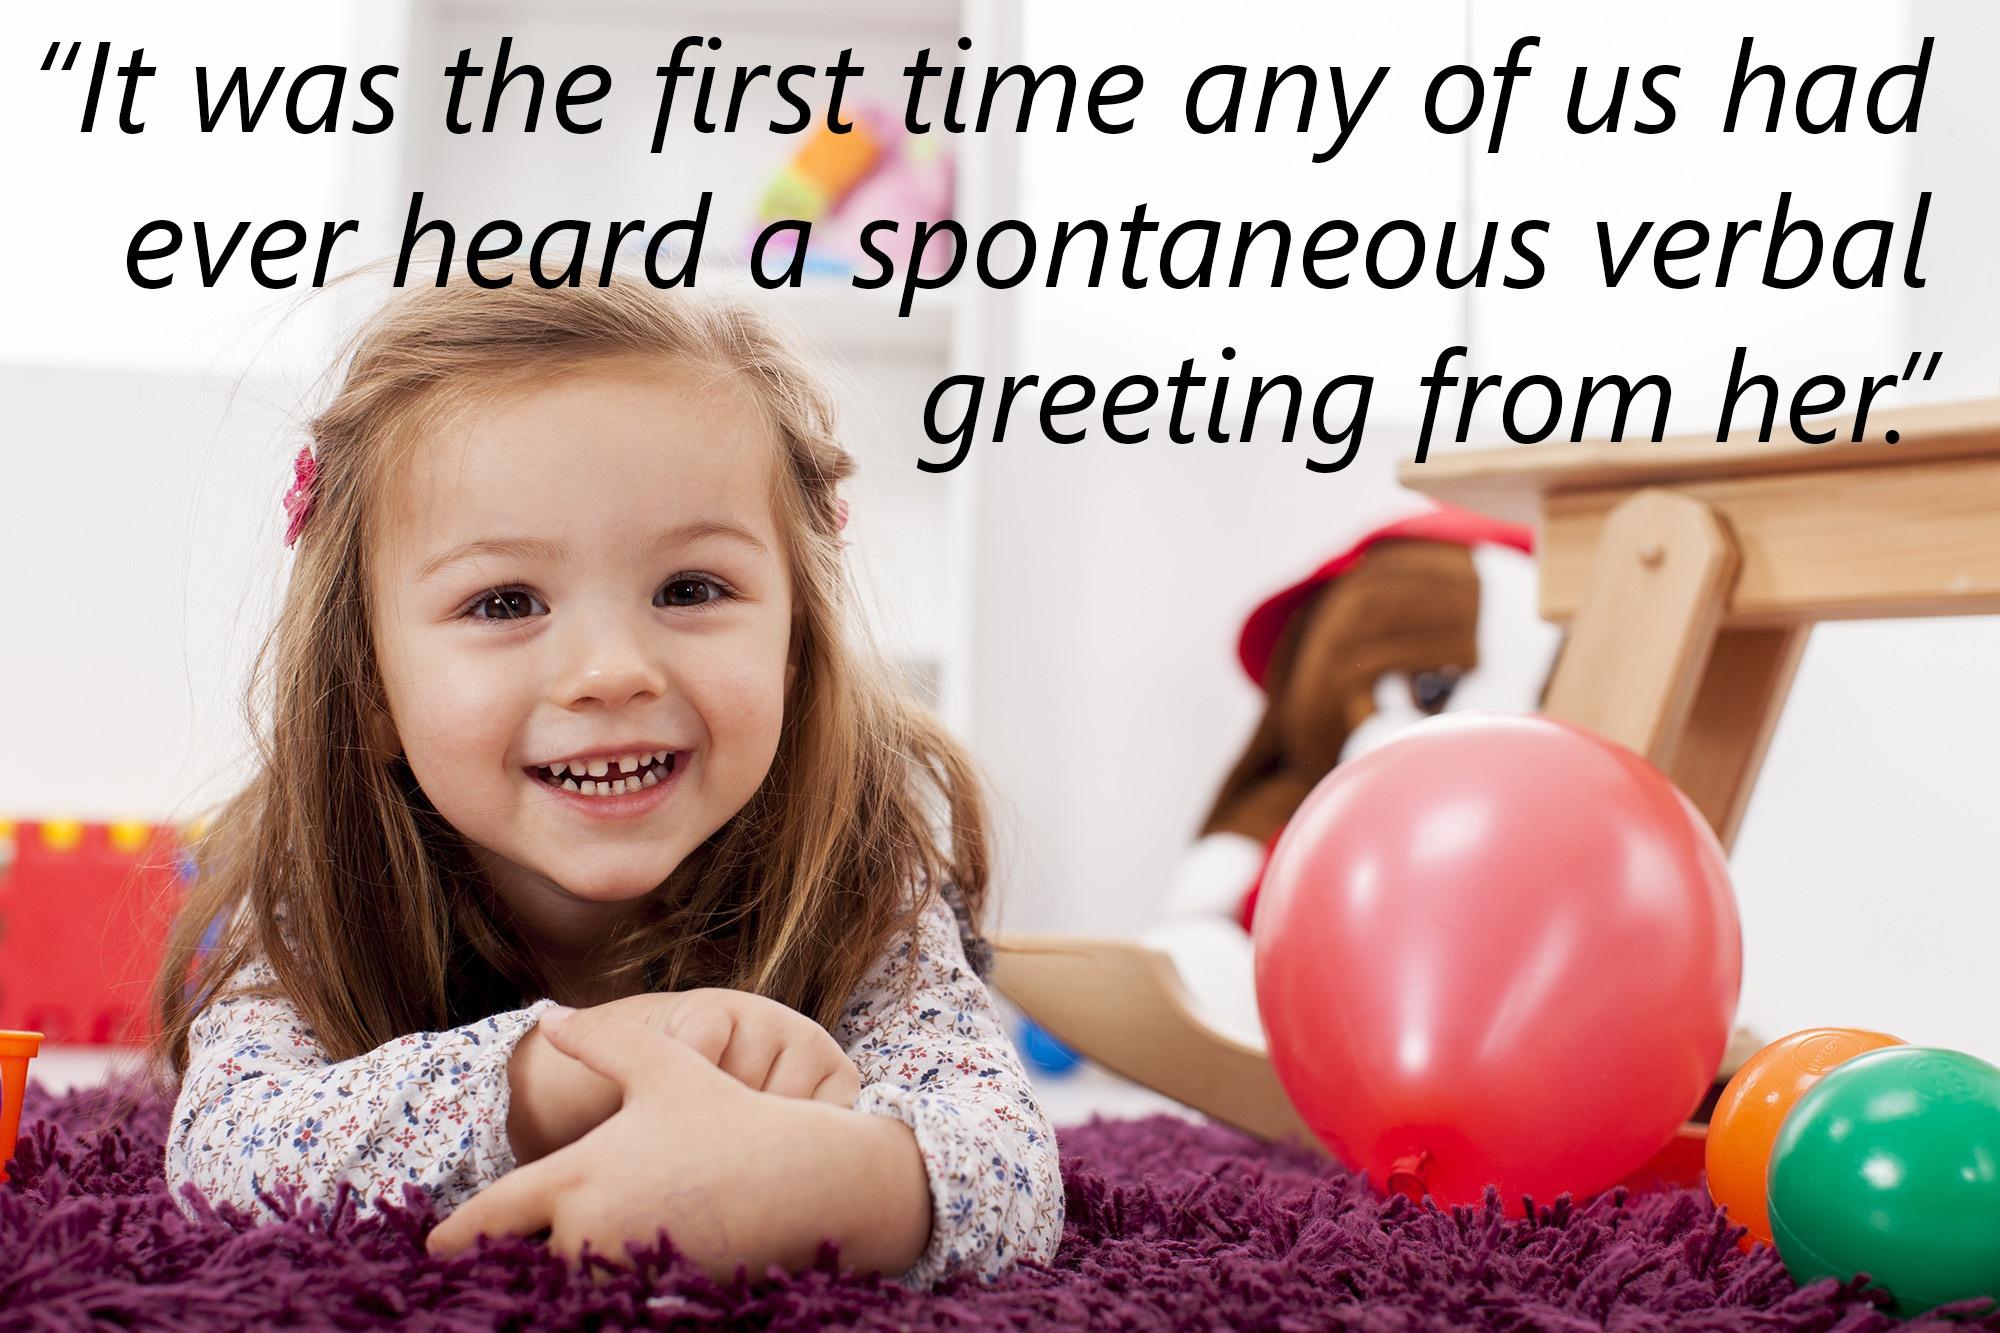 11.30.17 spontaneous greetingNO LOGO.jpg